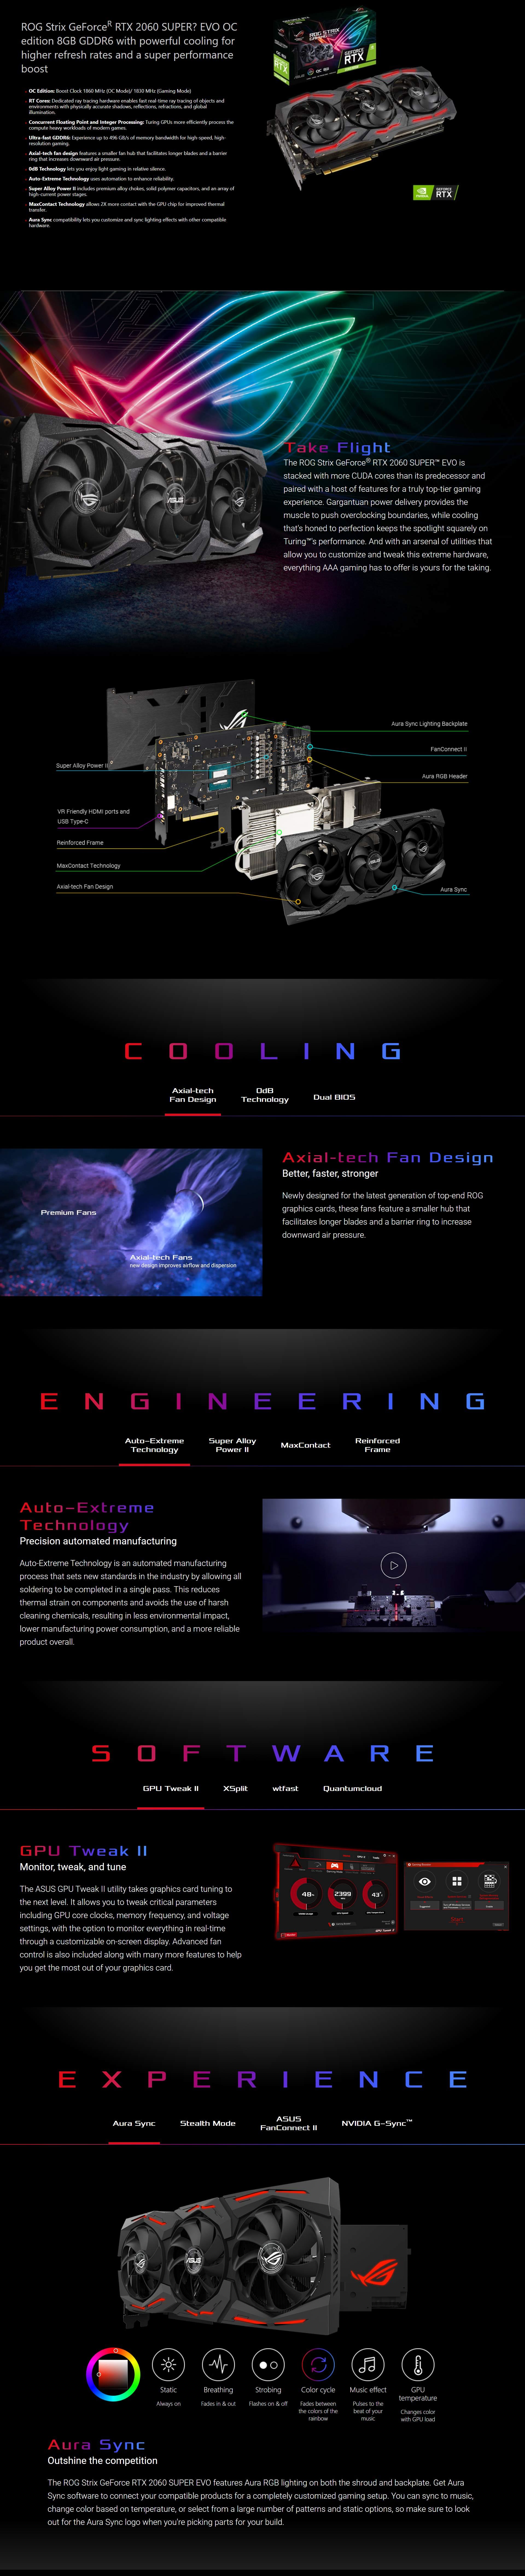 screencapture-asus-Graphics-Cards-ROG-STRIX-RTX2060S-O8G-EVO-GAMING-2020-08-04-14_01_59.jpg